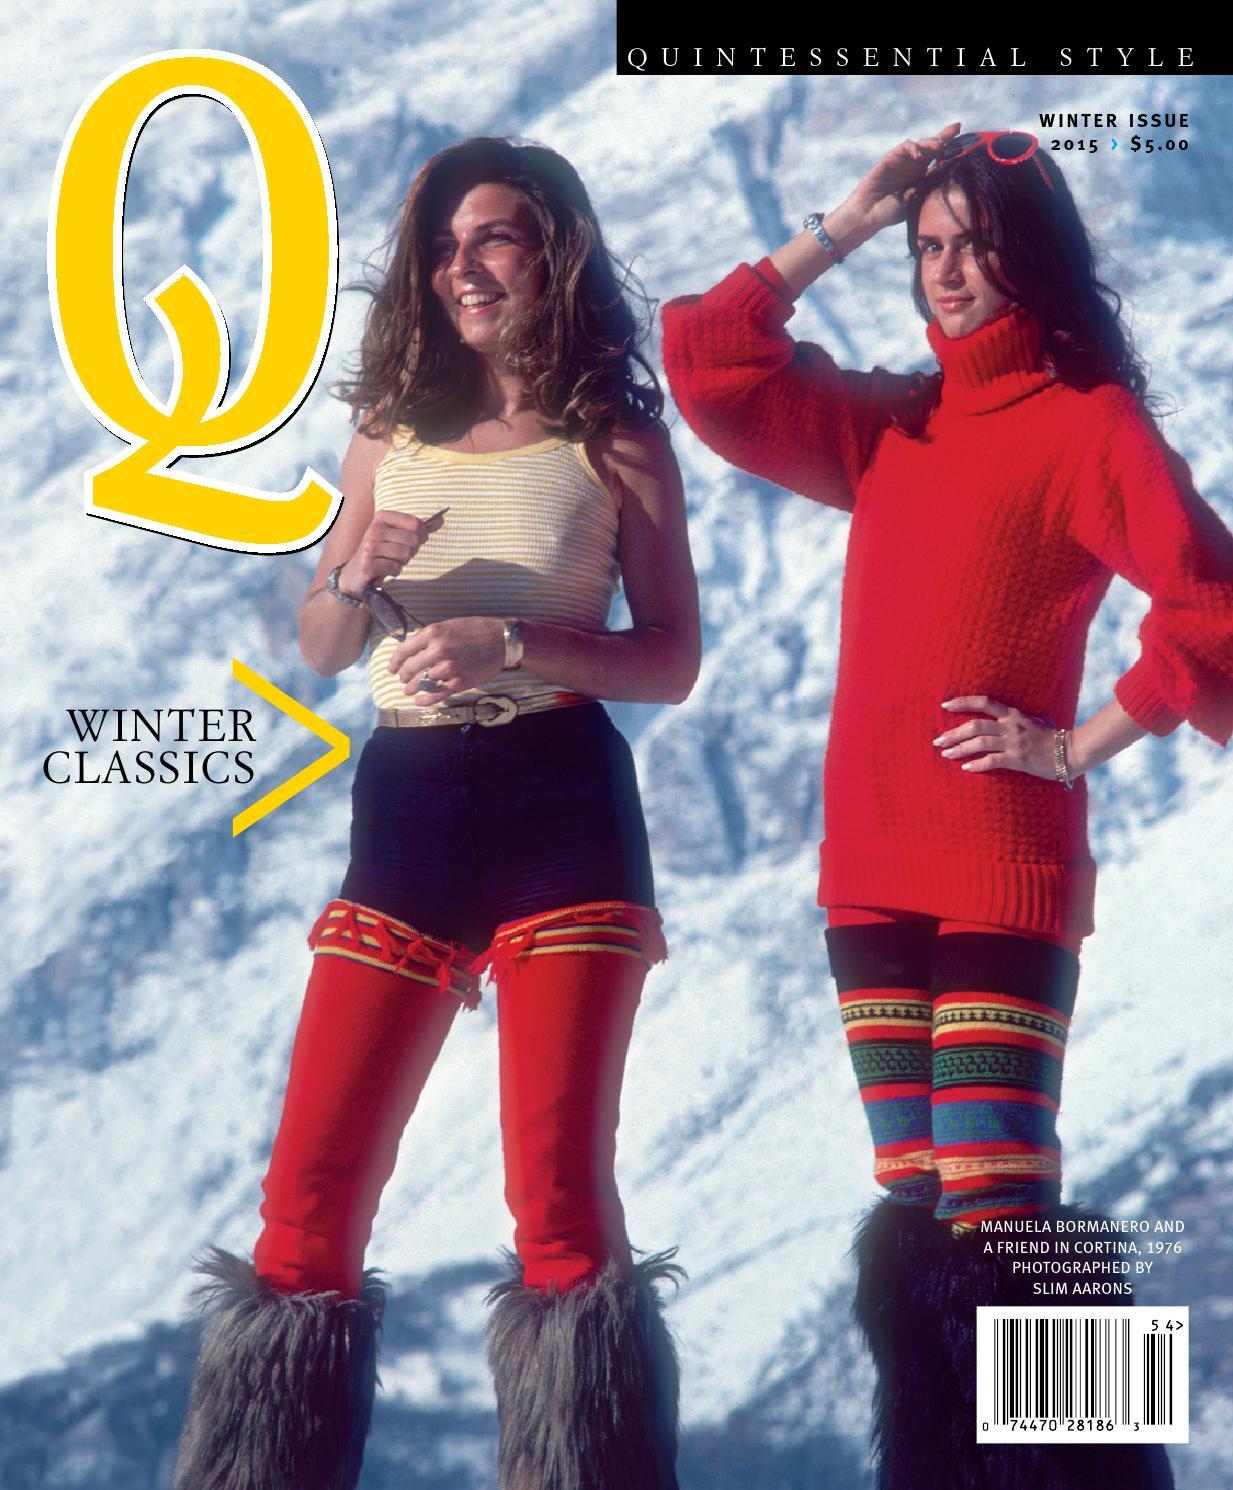 6f0b5b0b45eb Q Winter 2015 by QUEST Magazine - issuu